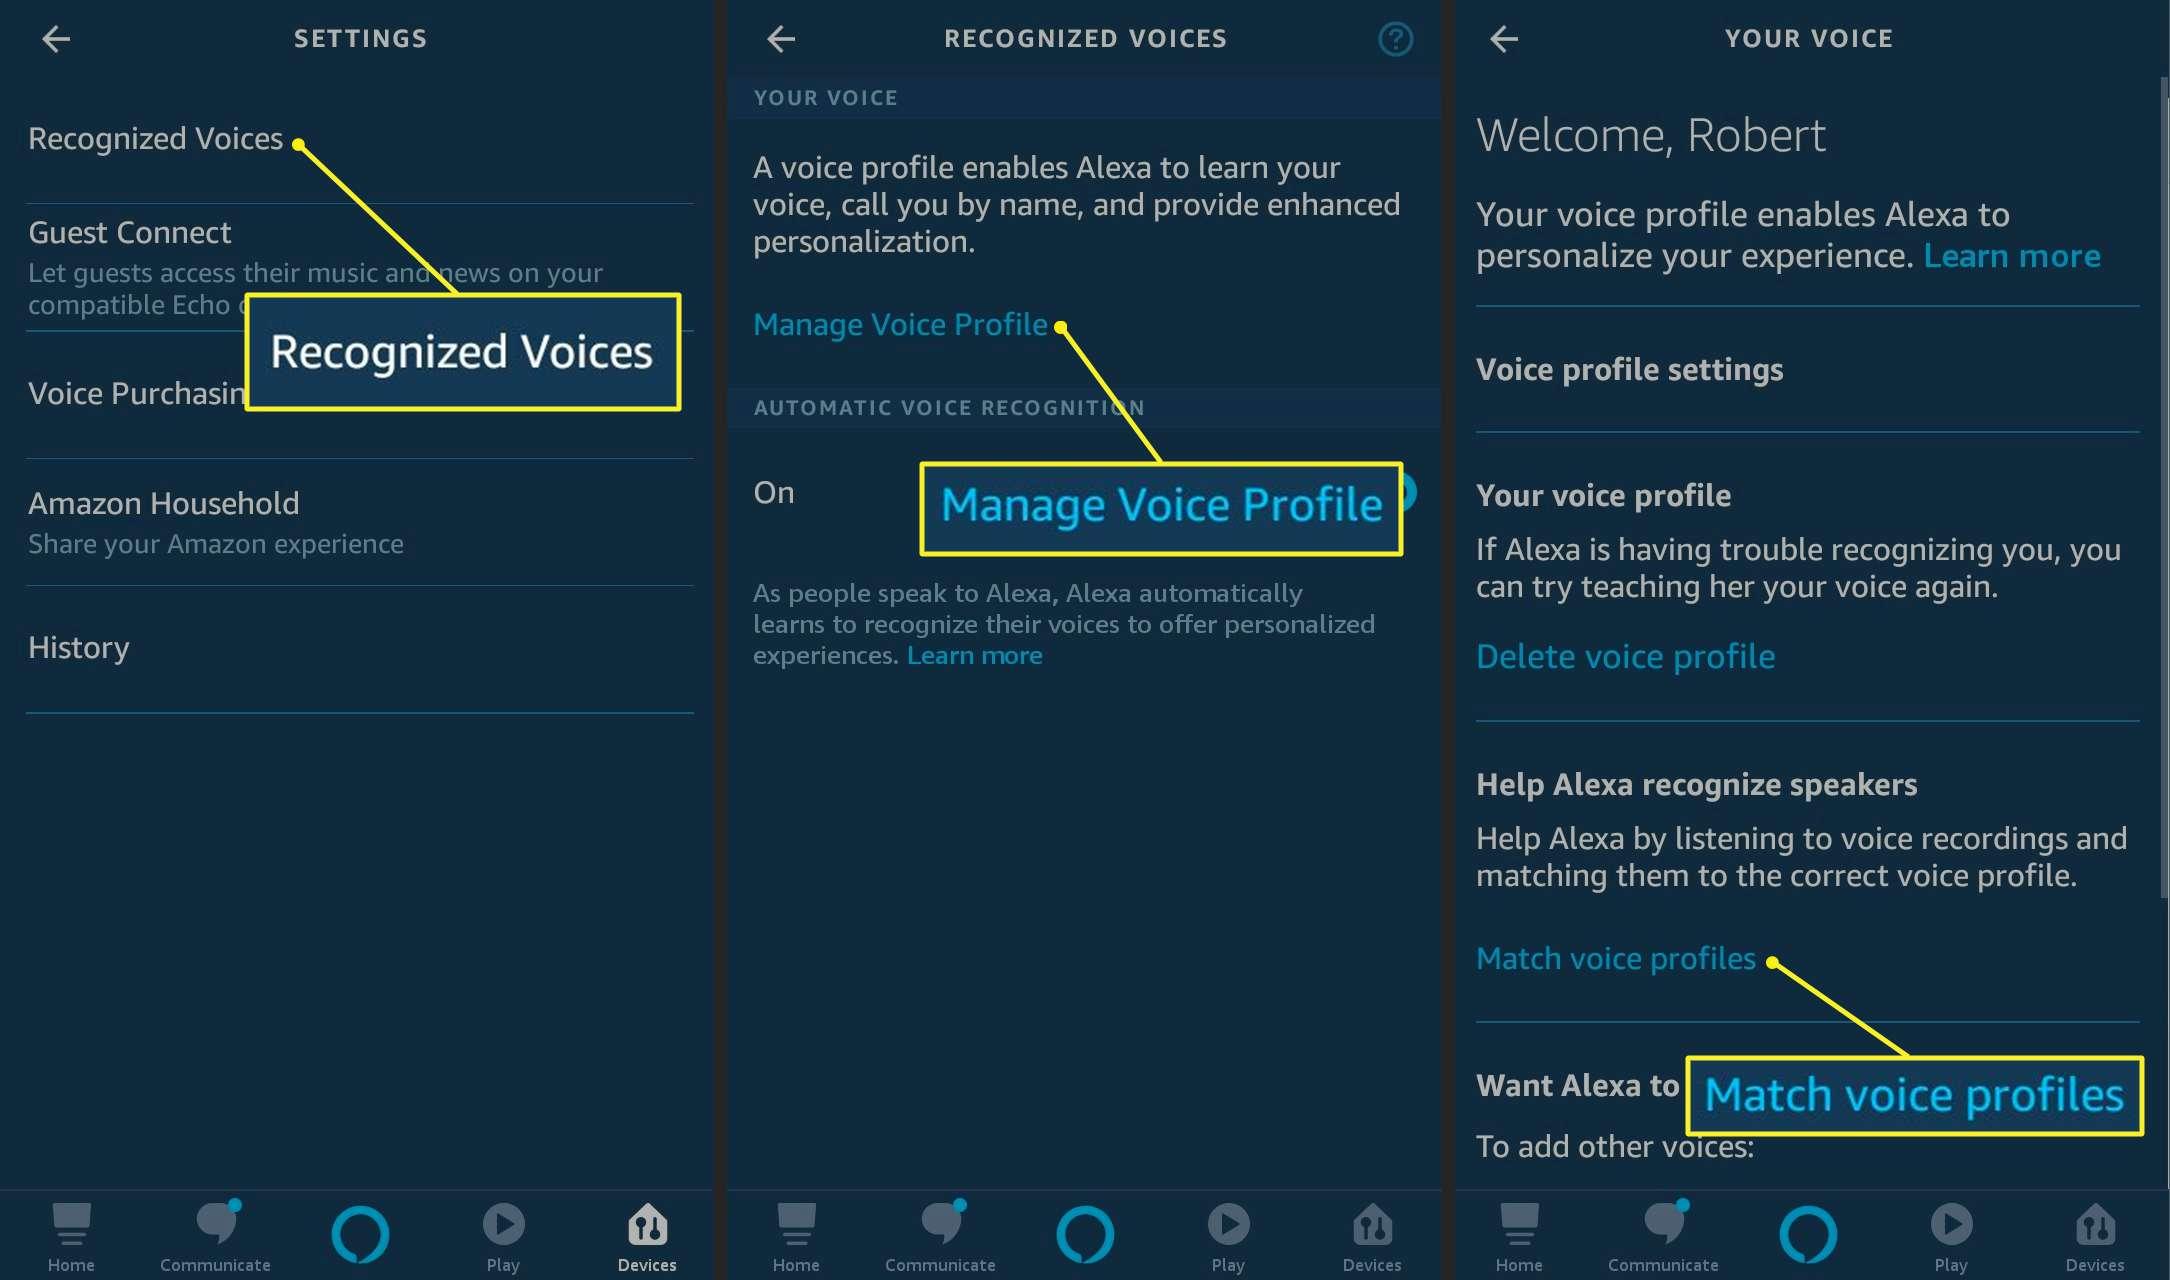 Matching voice profiles on Alexa app